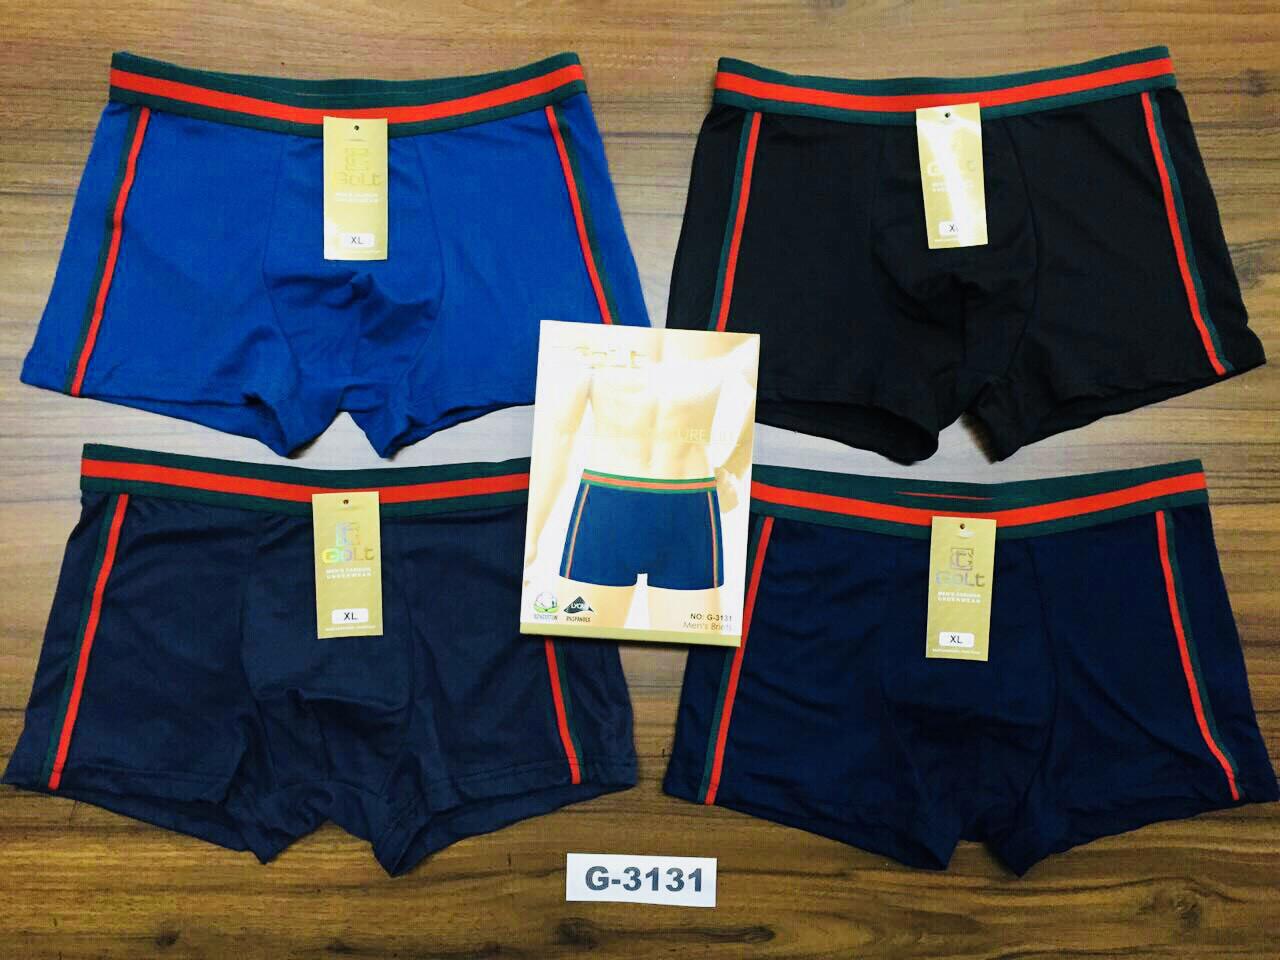 Трусы мужские боксёры хлопок + бамбук GOLT размер L-3XL(46-54) 3131